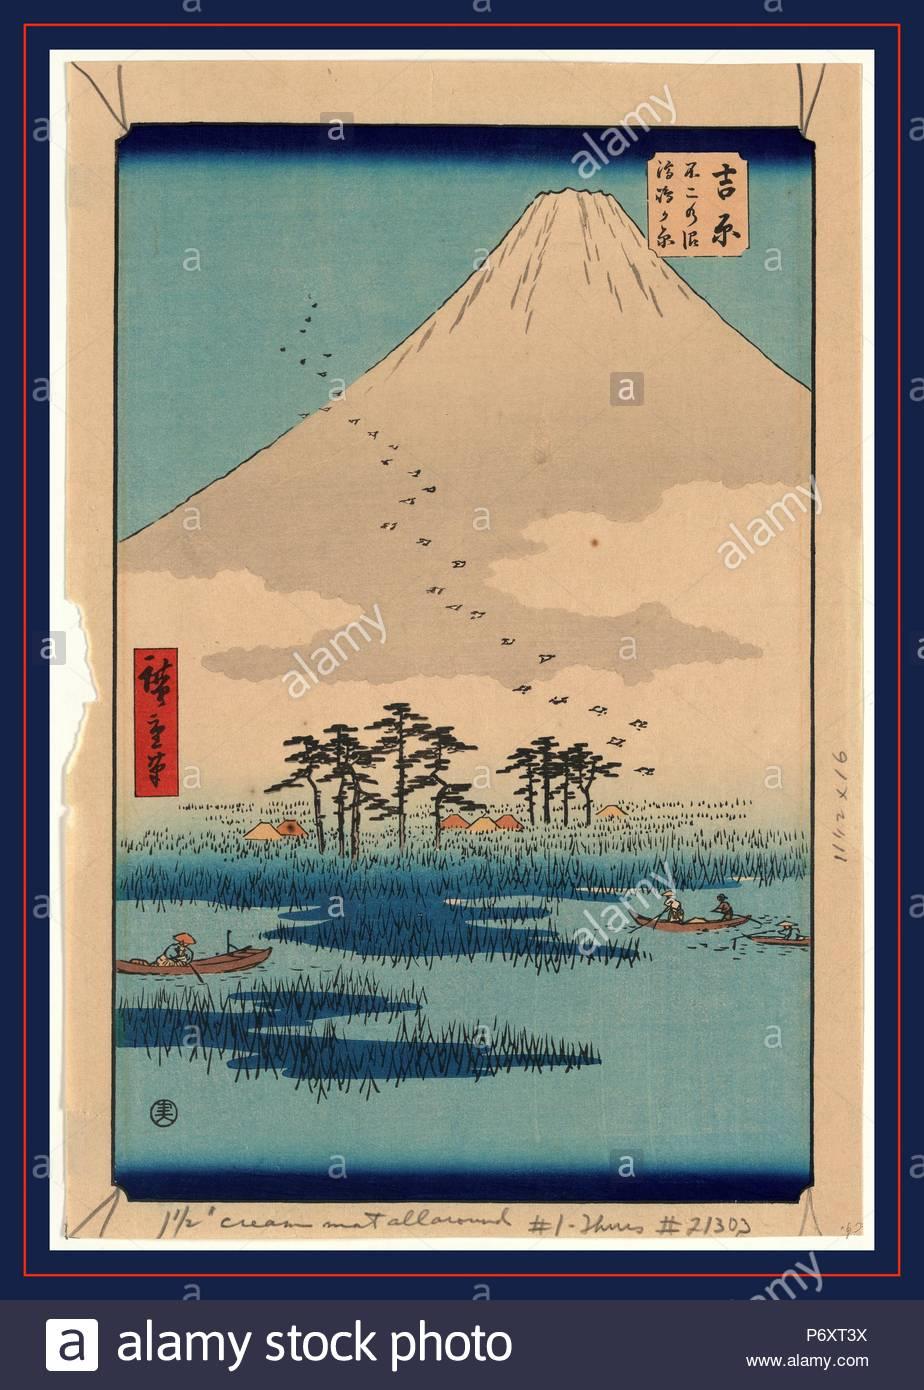 yoshiwara ando hiroshige 1797 1858 artist 1855 printed later